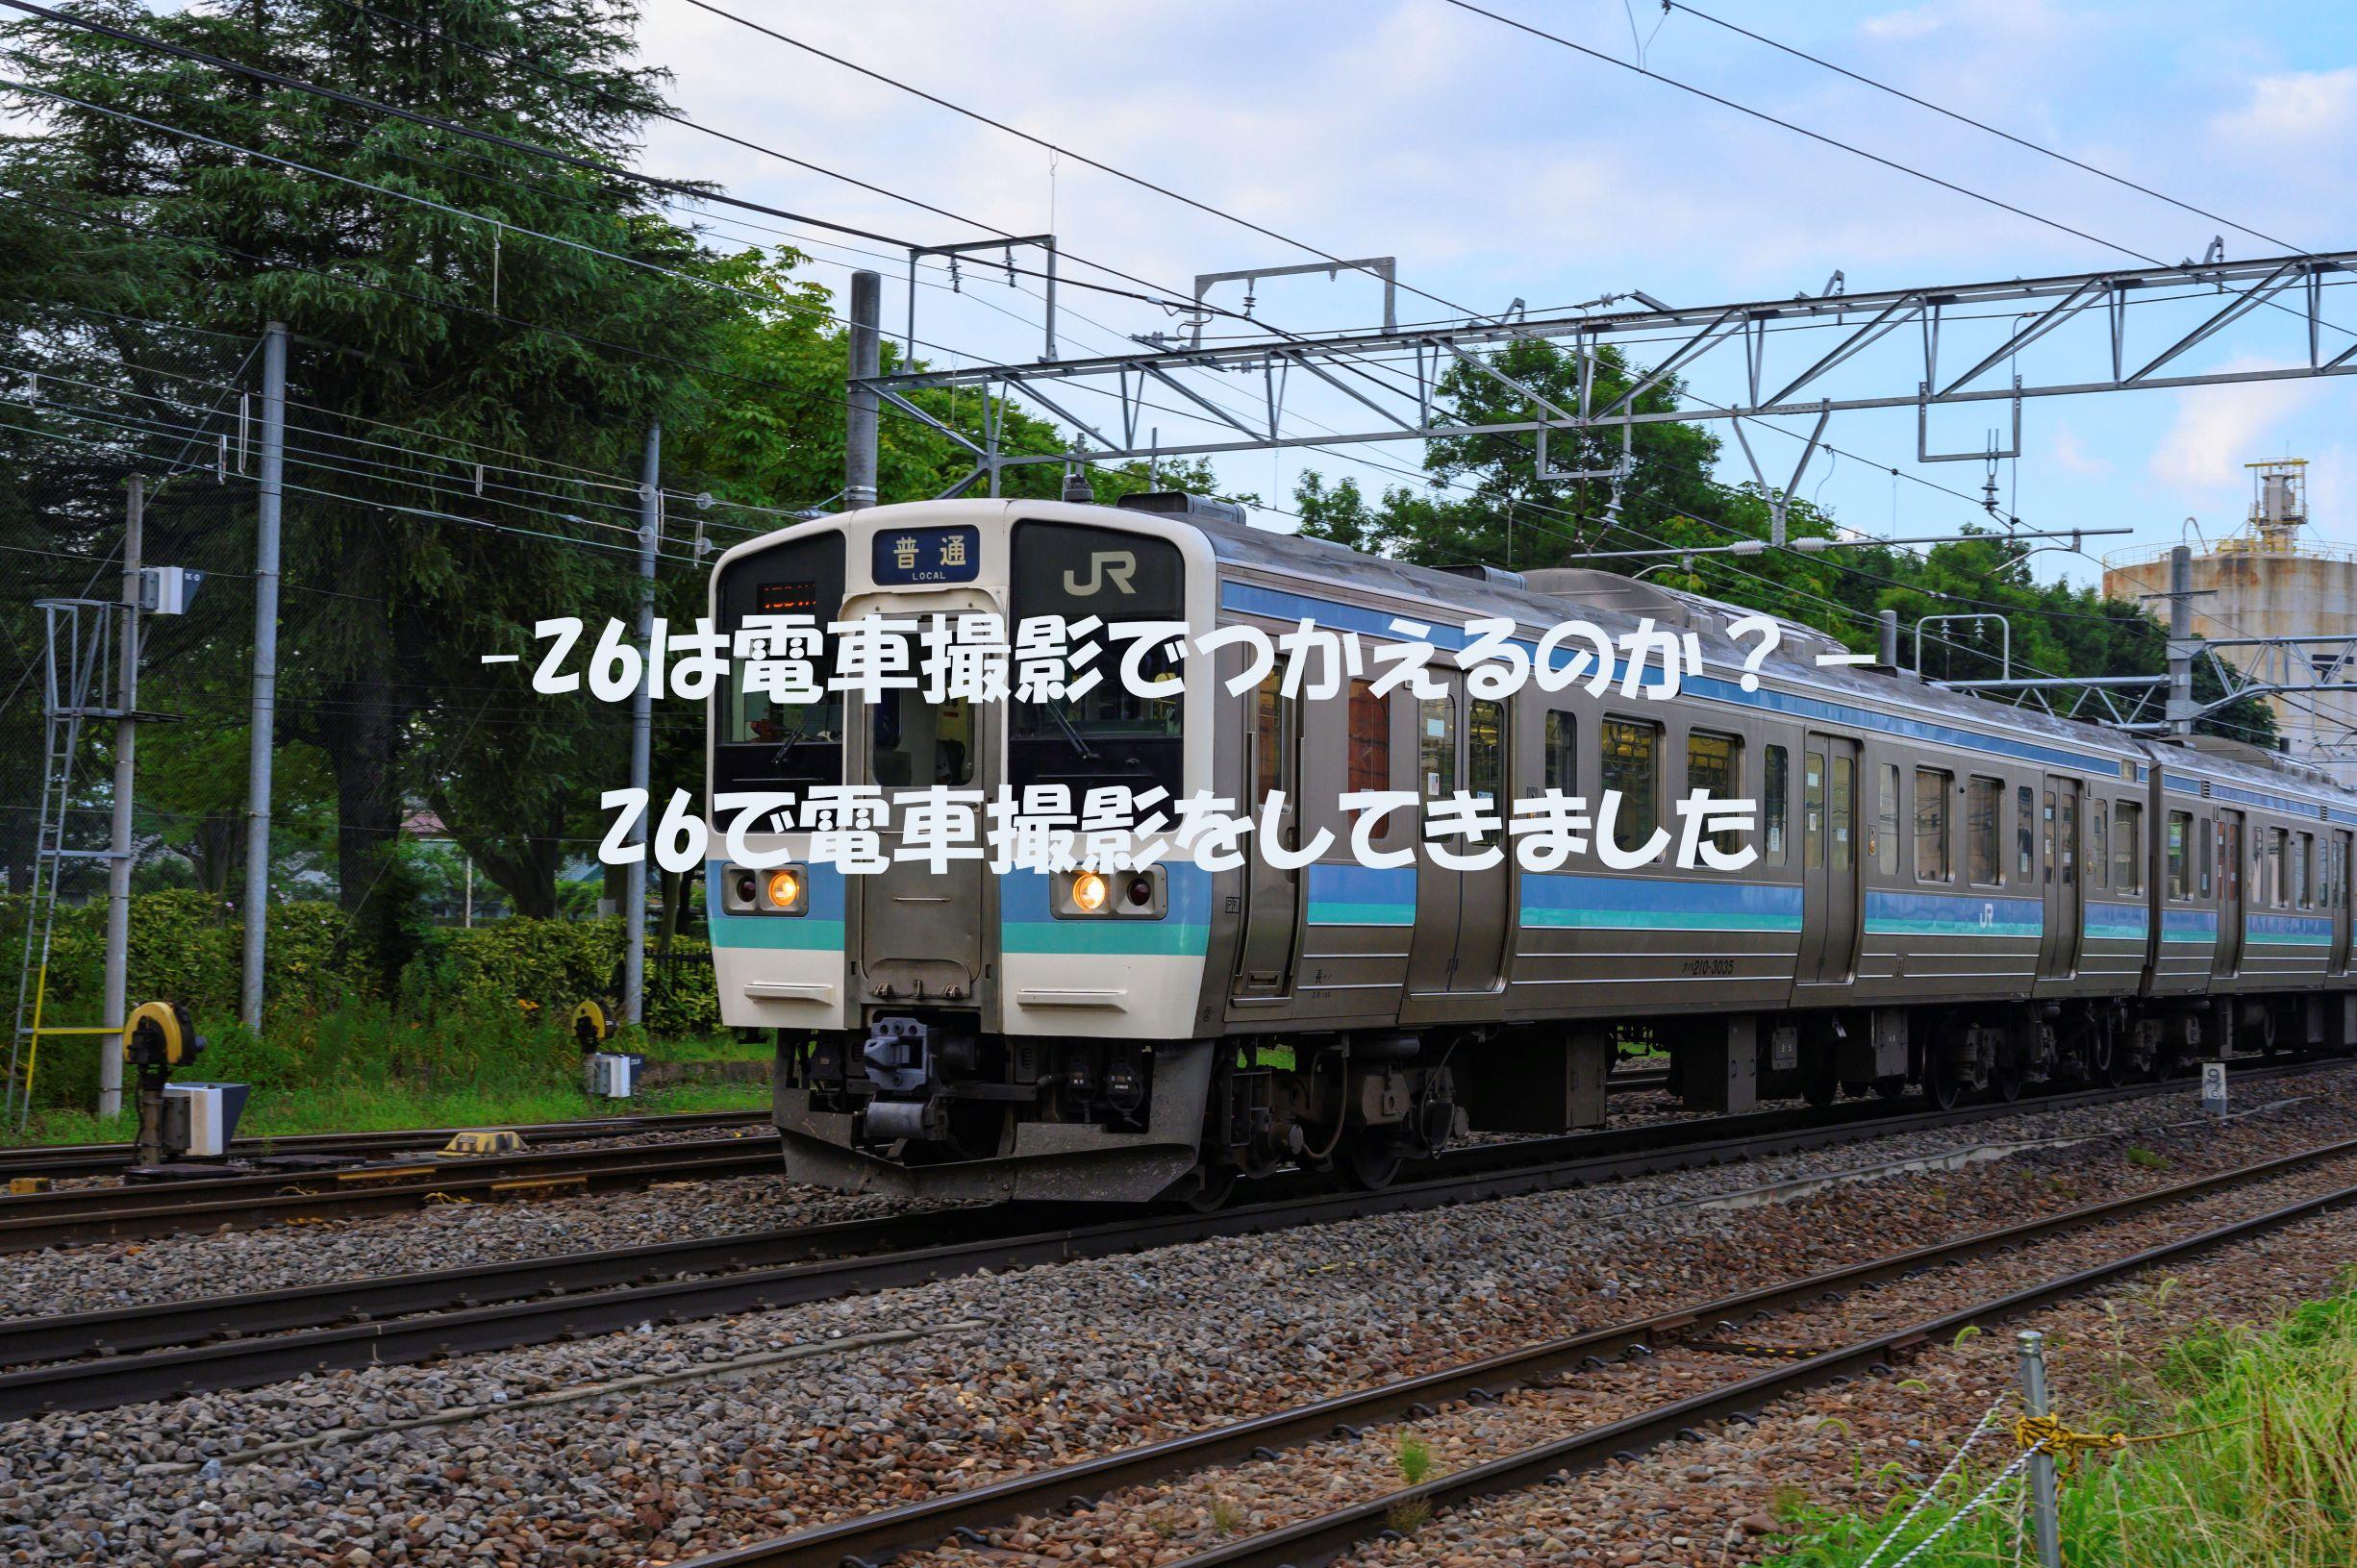 Z6で電車を撮影してきました。特急あずさなどのAF追従性などについて